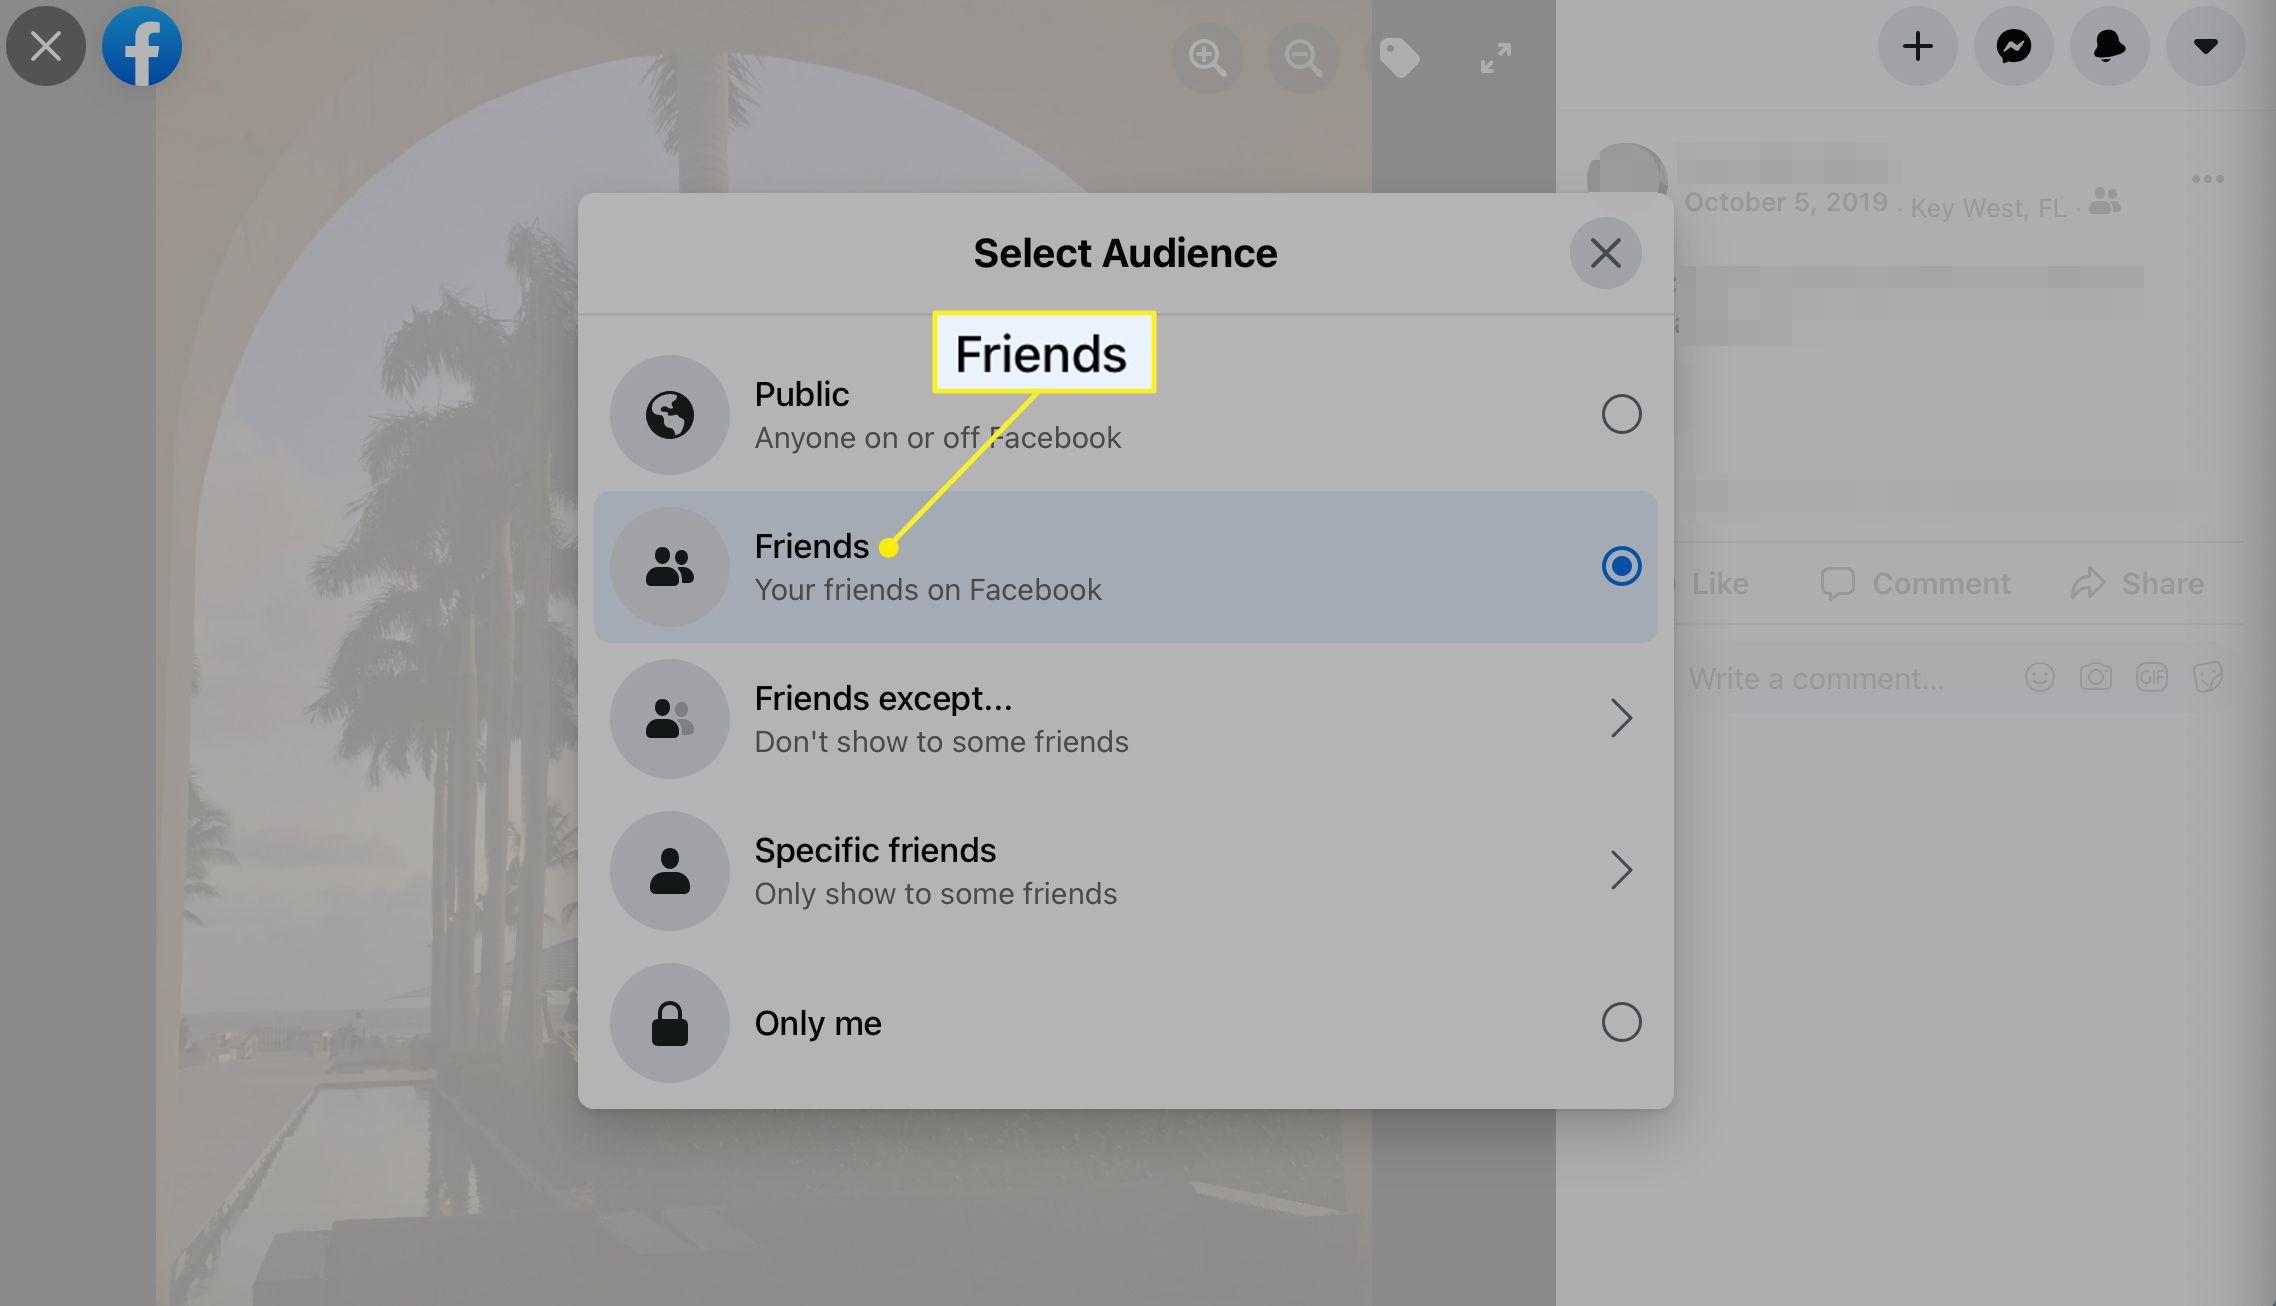 The Select Audience pop-up menu in Facebook